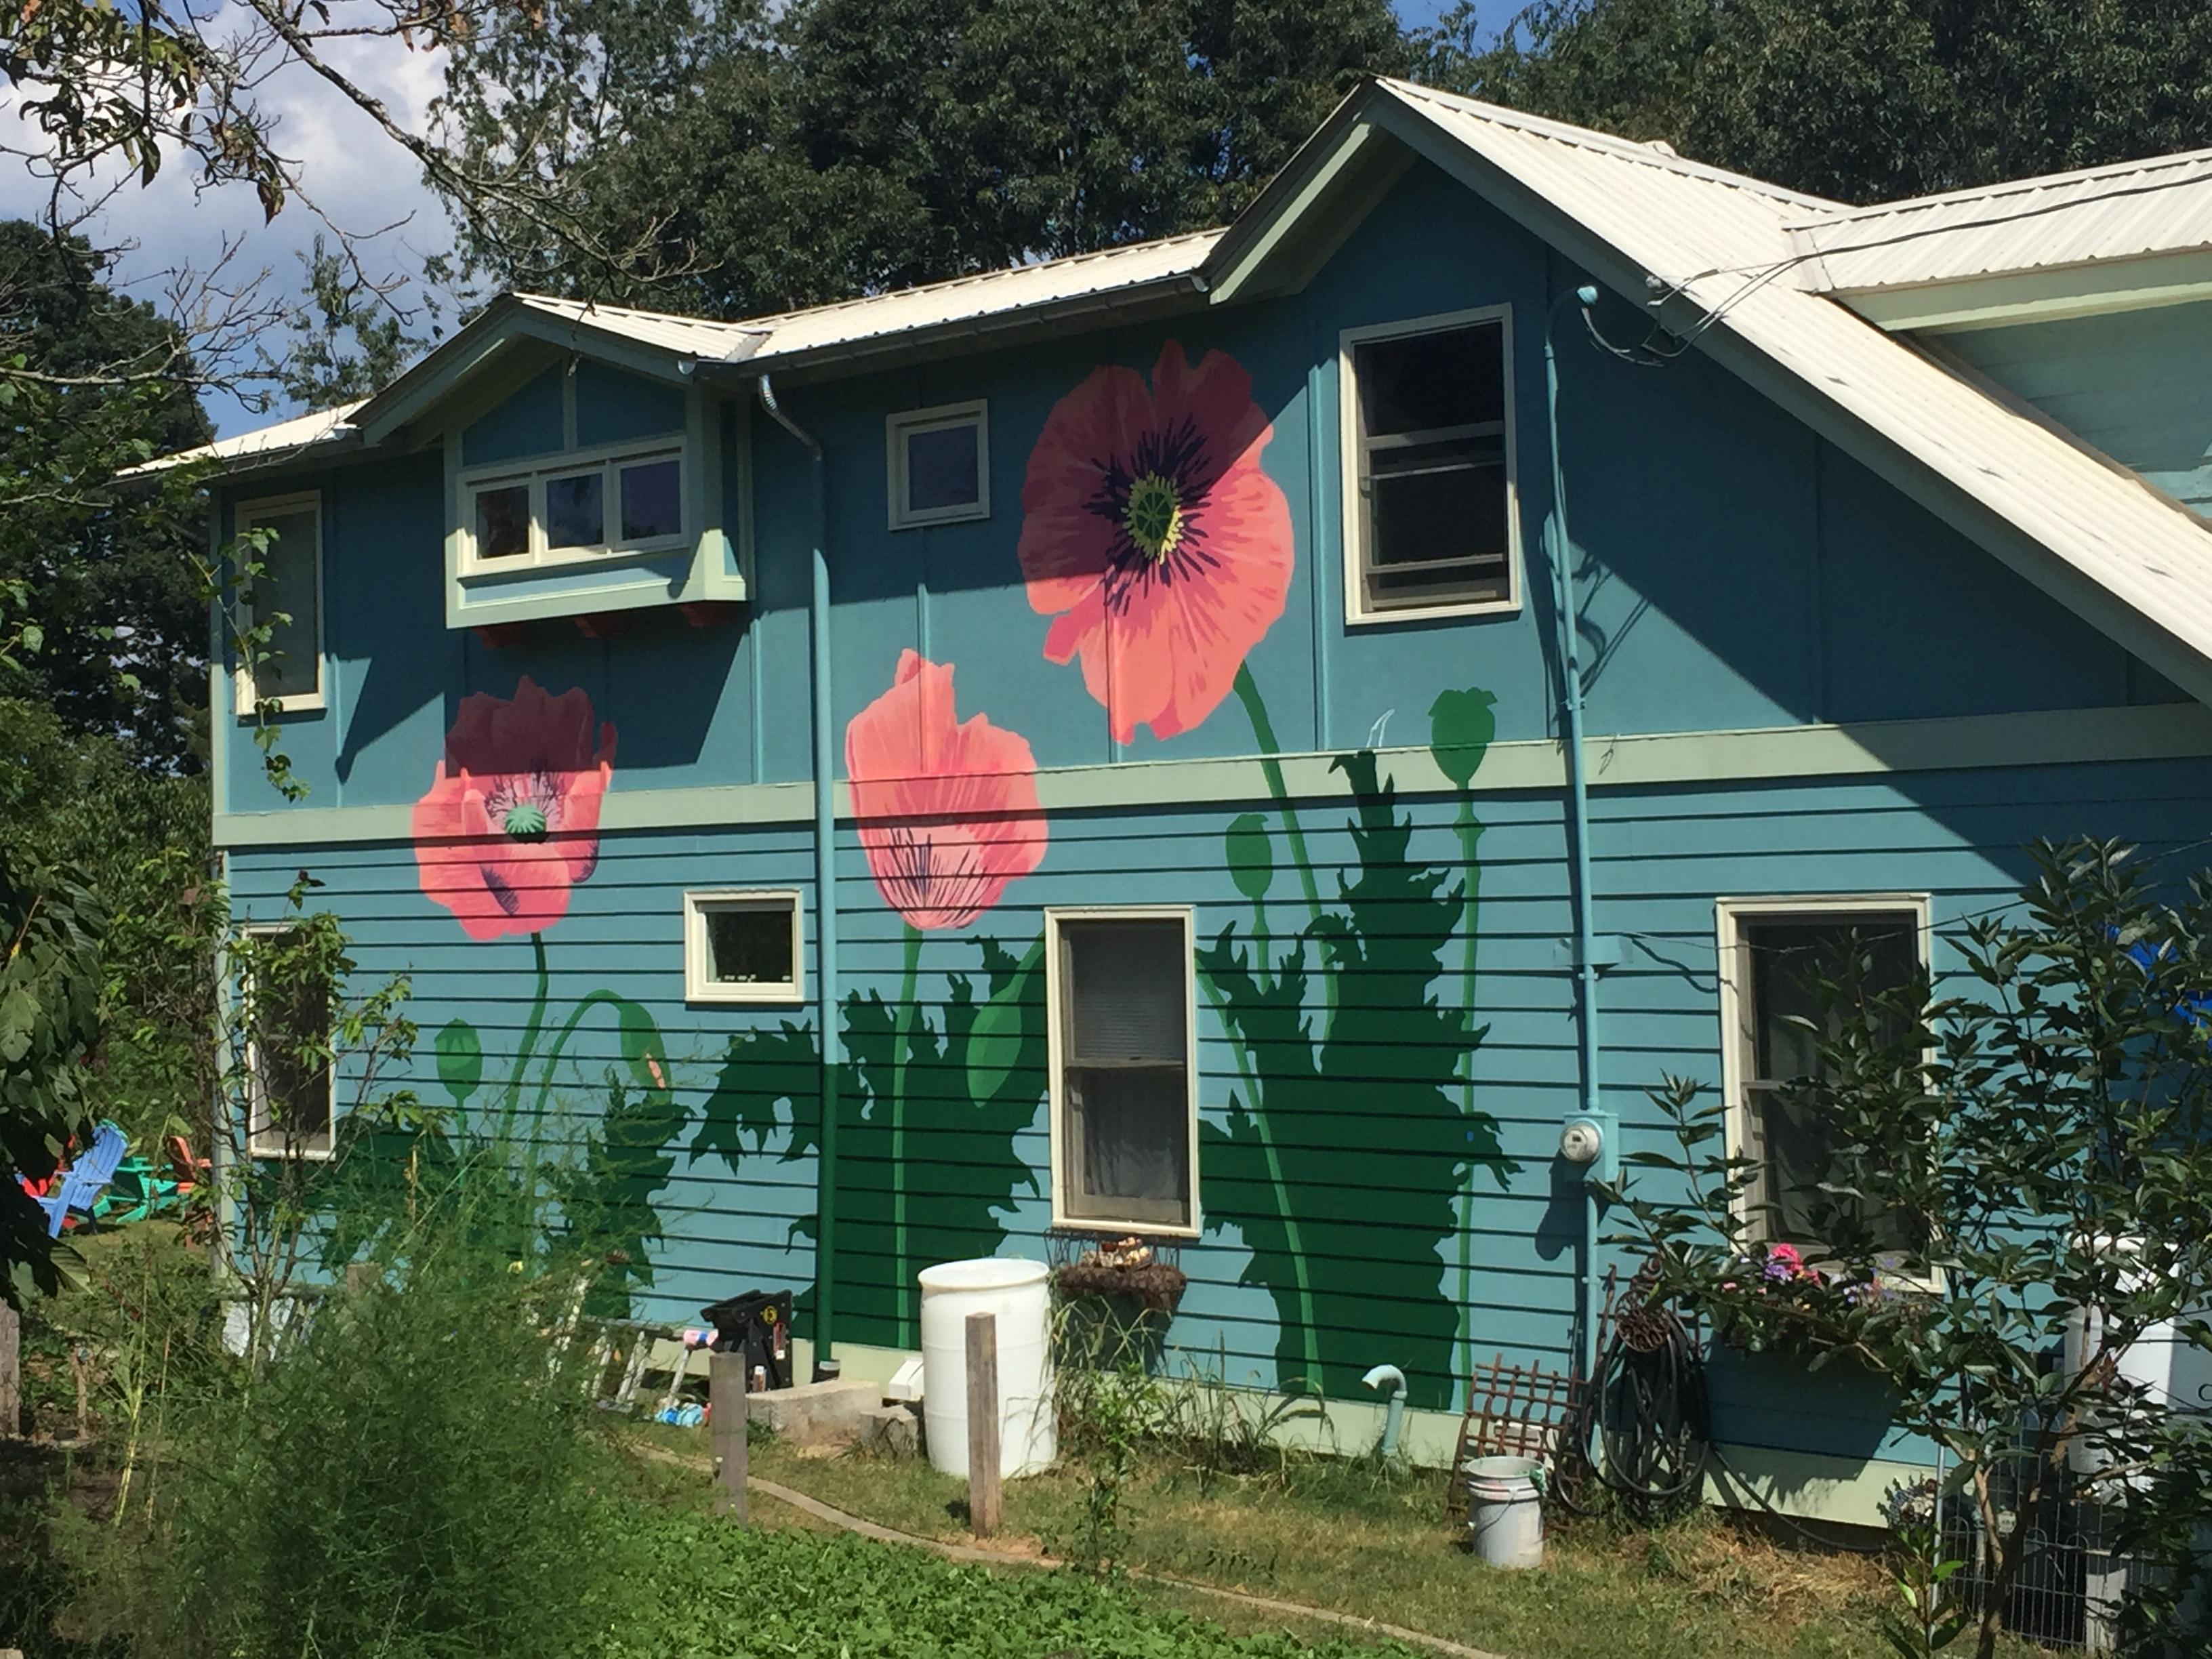 Real Estate Raisal Home Raiser Residential Raisals Asheville Nc Mountain Service Llc